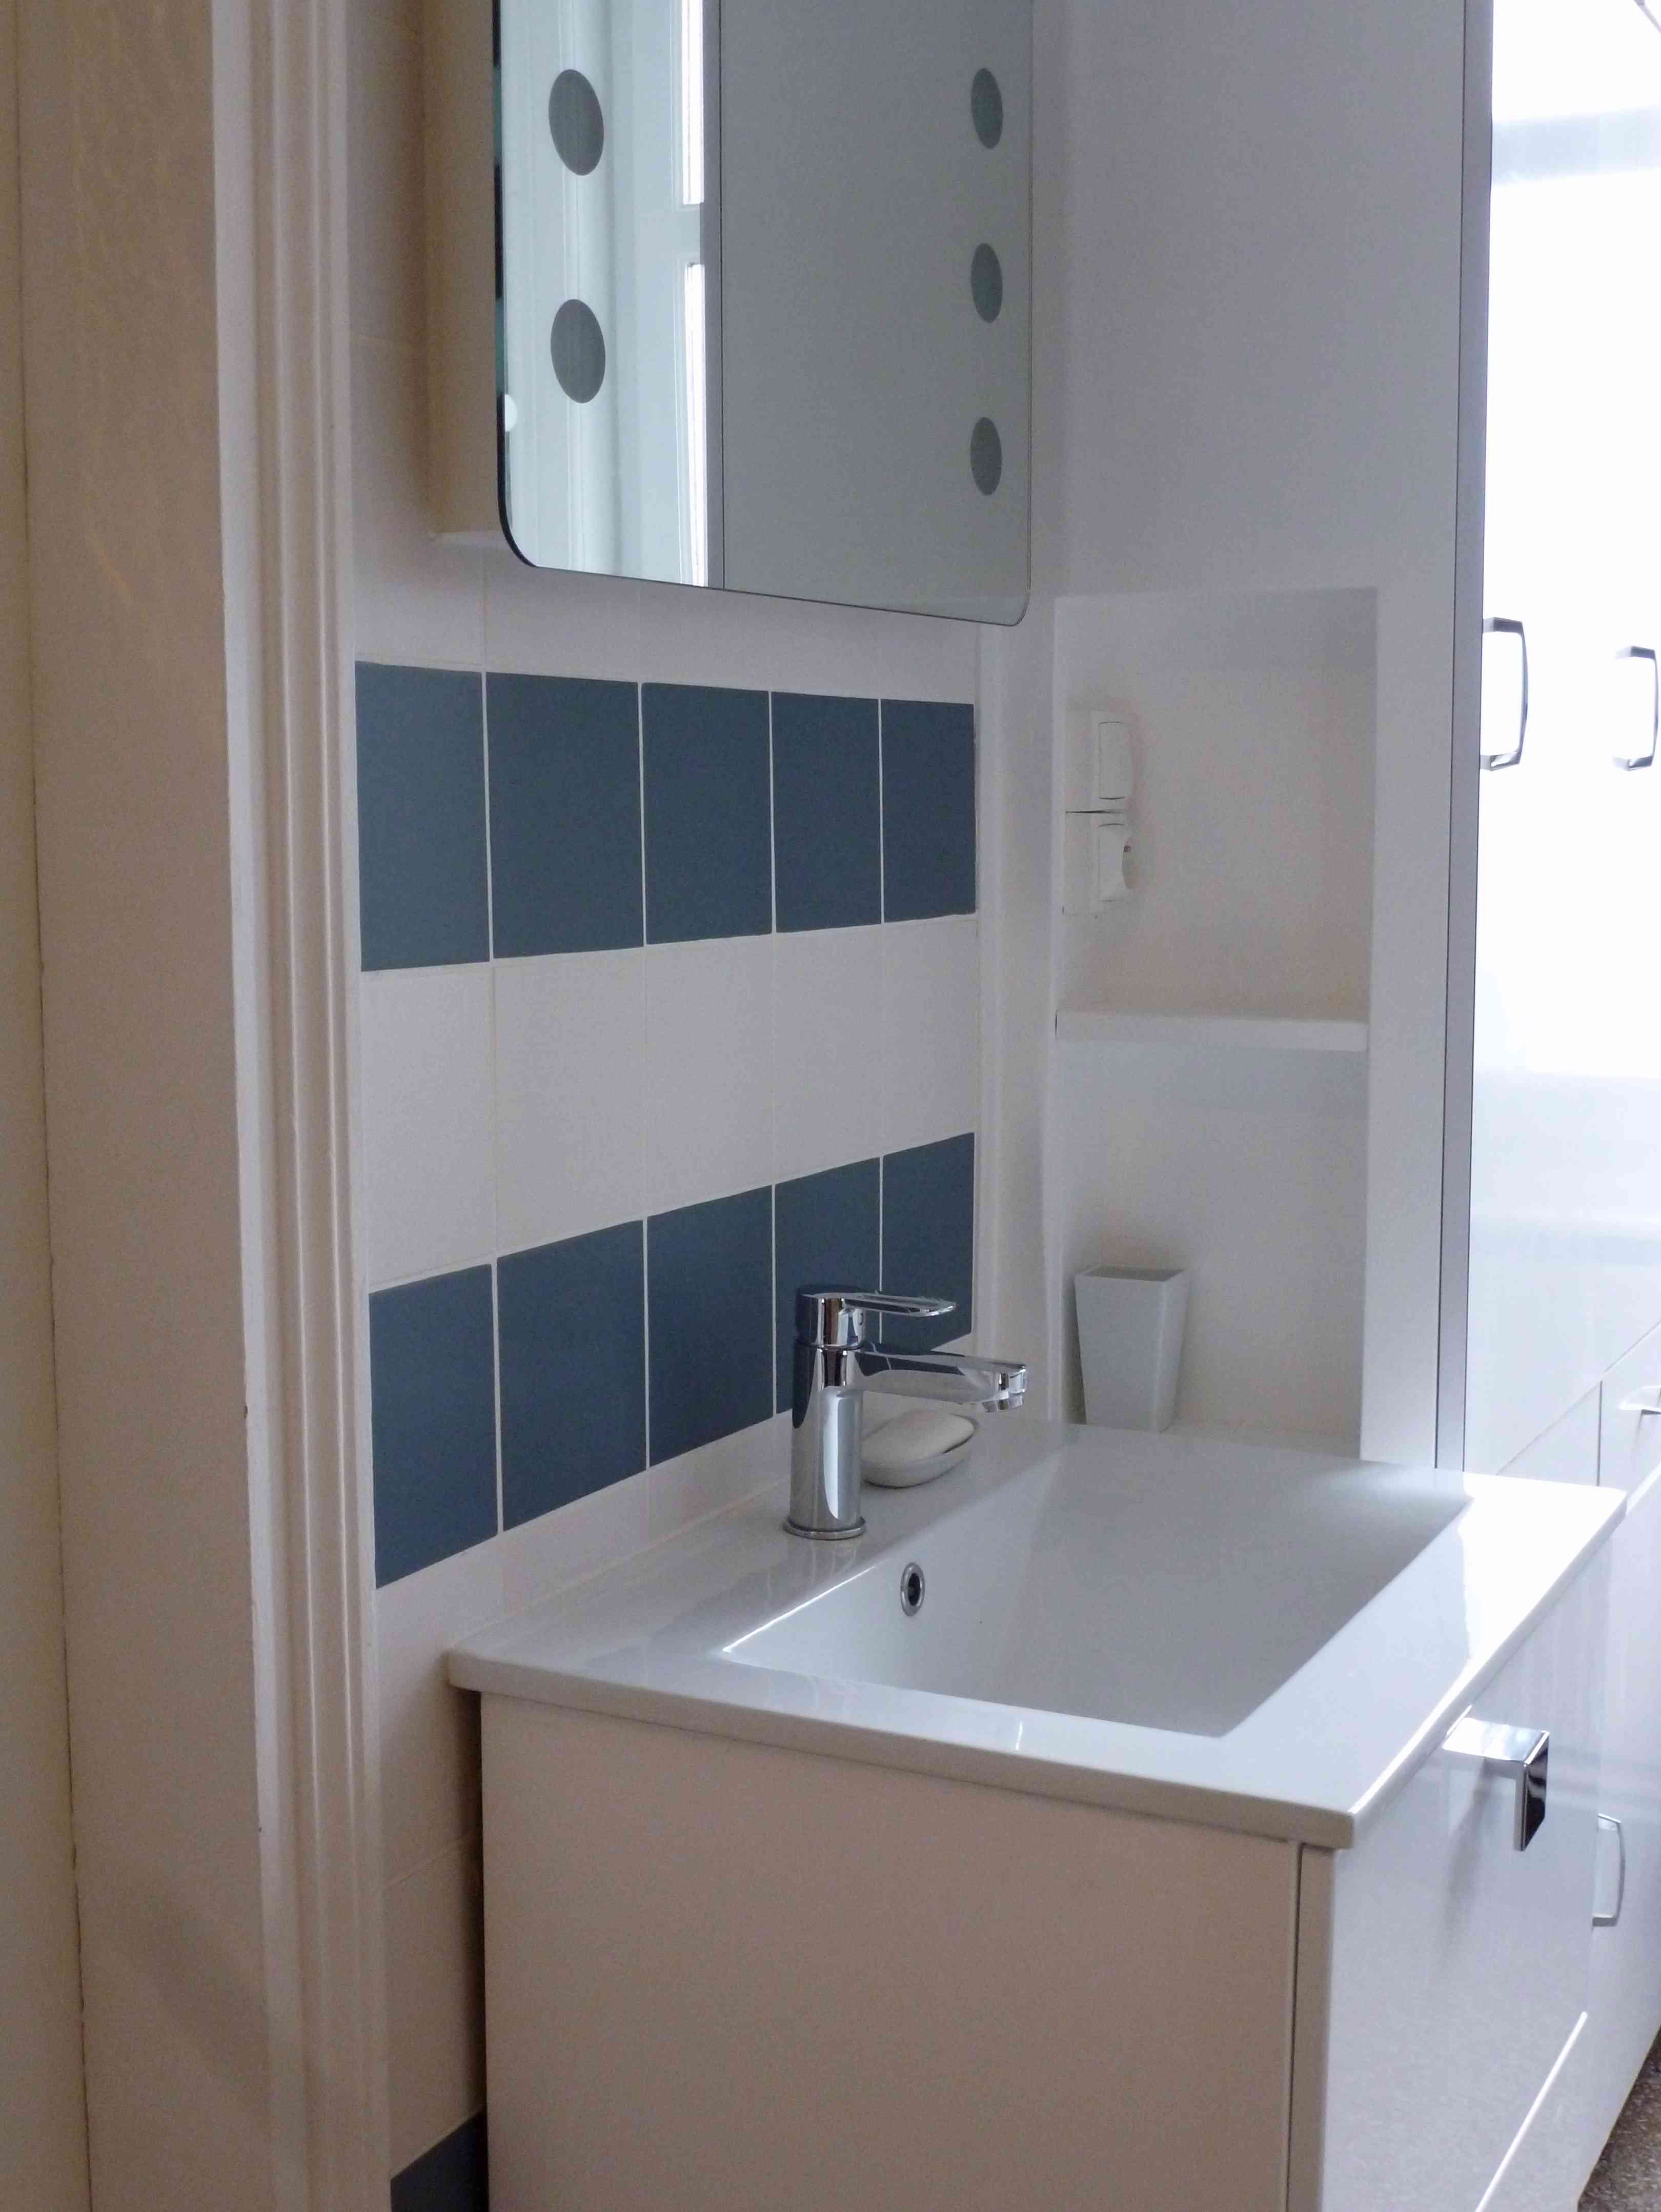 Salle de bain Lille Renovation Conseil deco